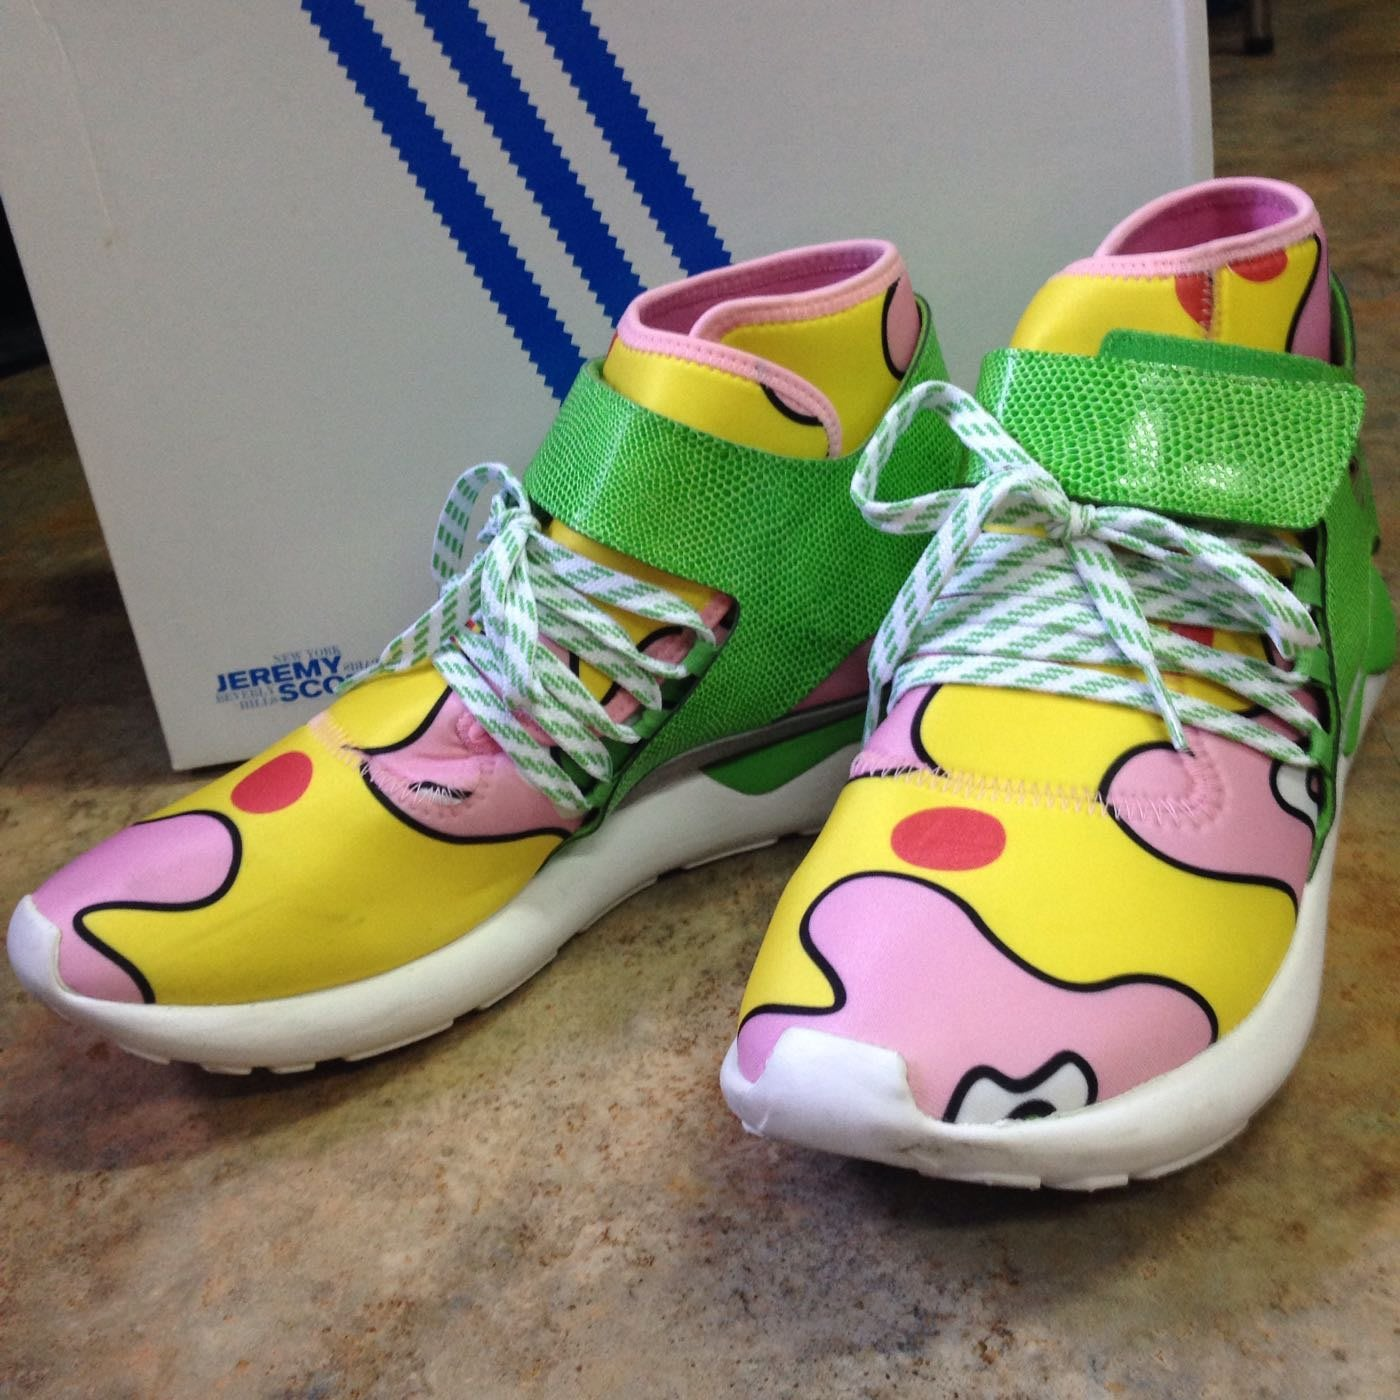 san francisco 5fa14 21637 (定價對折以下超低價) adidas Originals x Jeremy Scott JS Tubular   Yahoo奇摩拍賣